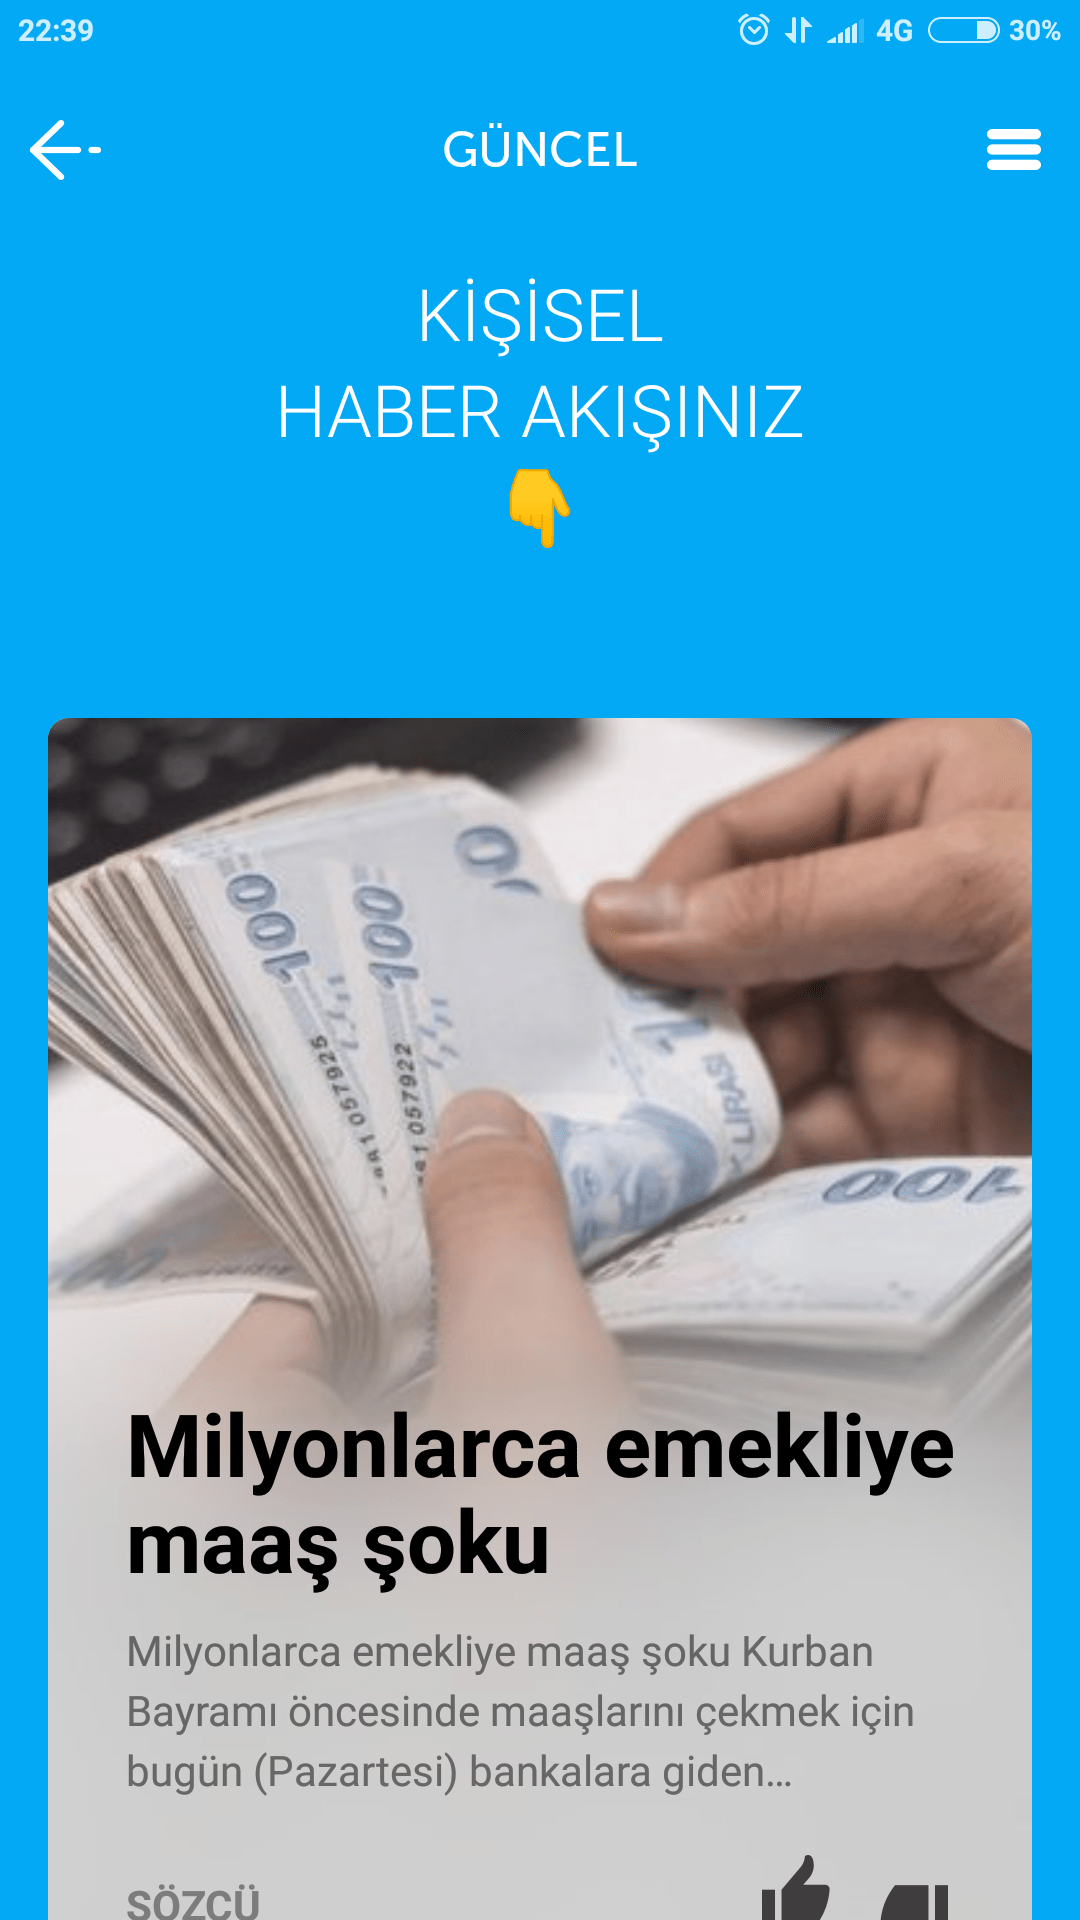 Turkcell BiP Nedir? Ne İşe Yarar?